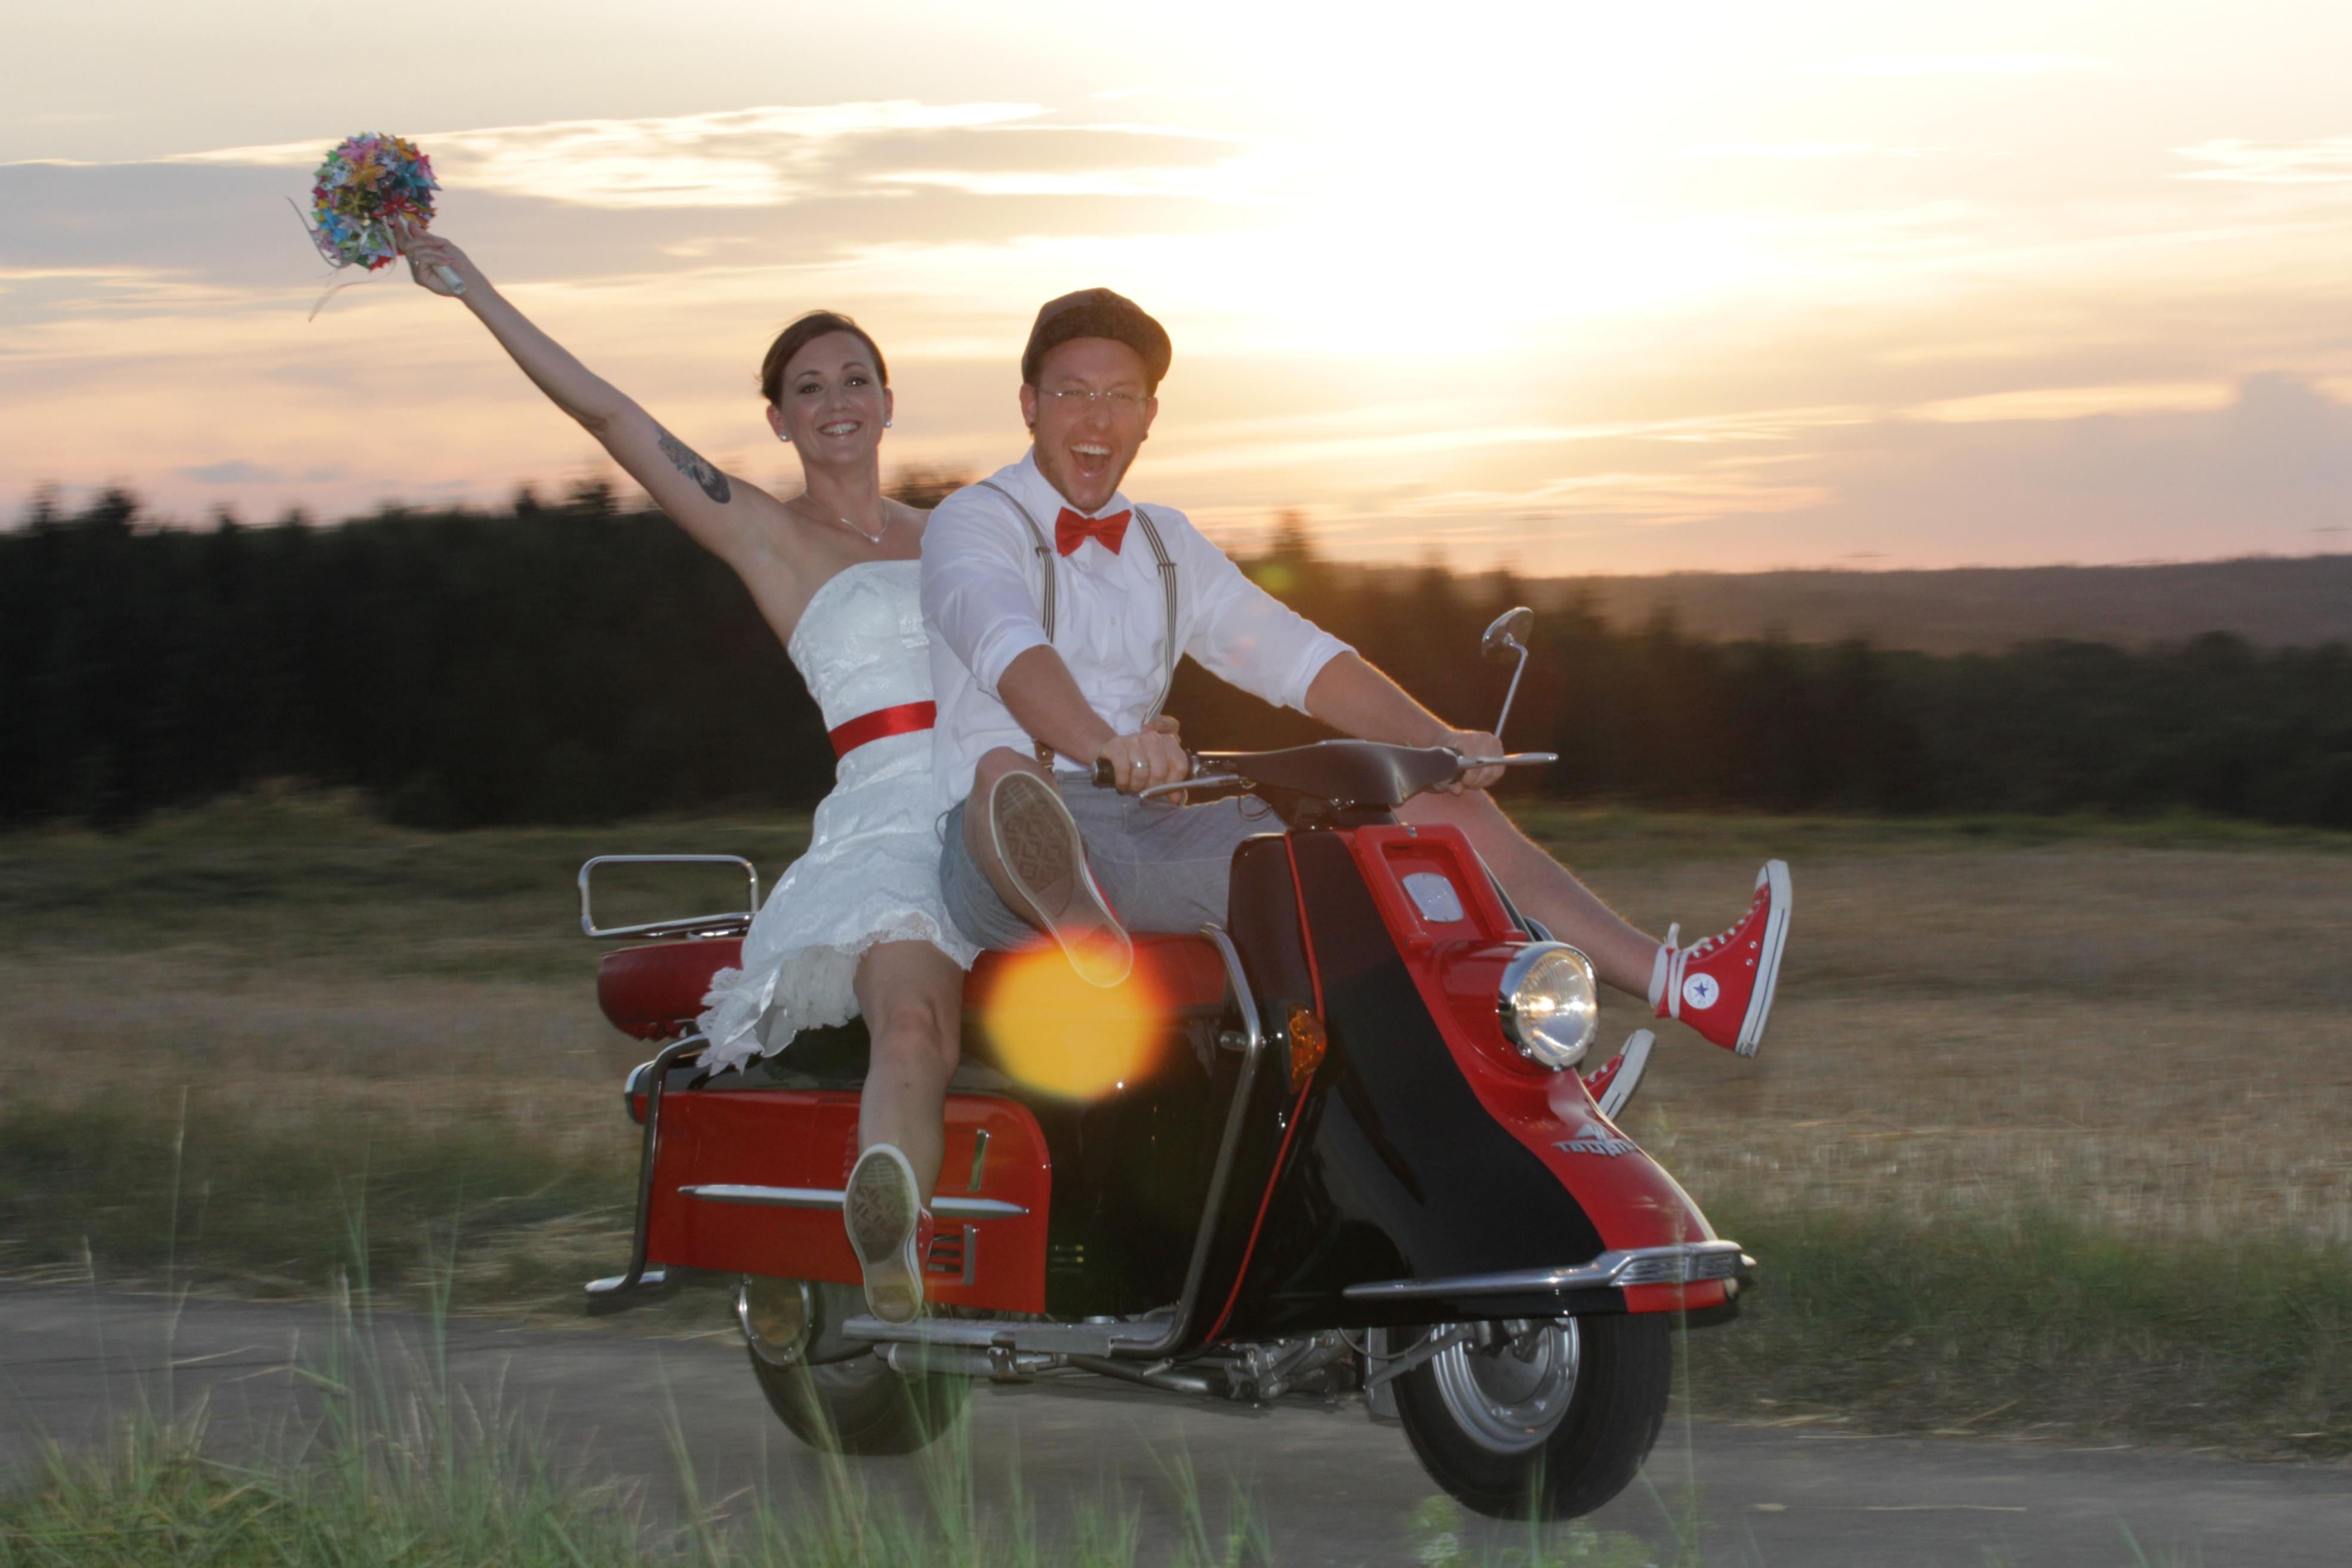 Blicklokal Brautpaar Dorothée Popp & Stephan Noe Standesamtliche Trauung: 01.08.2015 Buchen